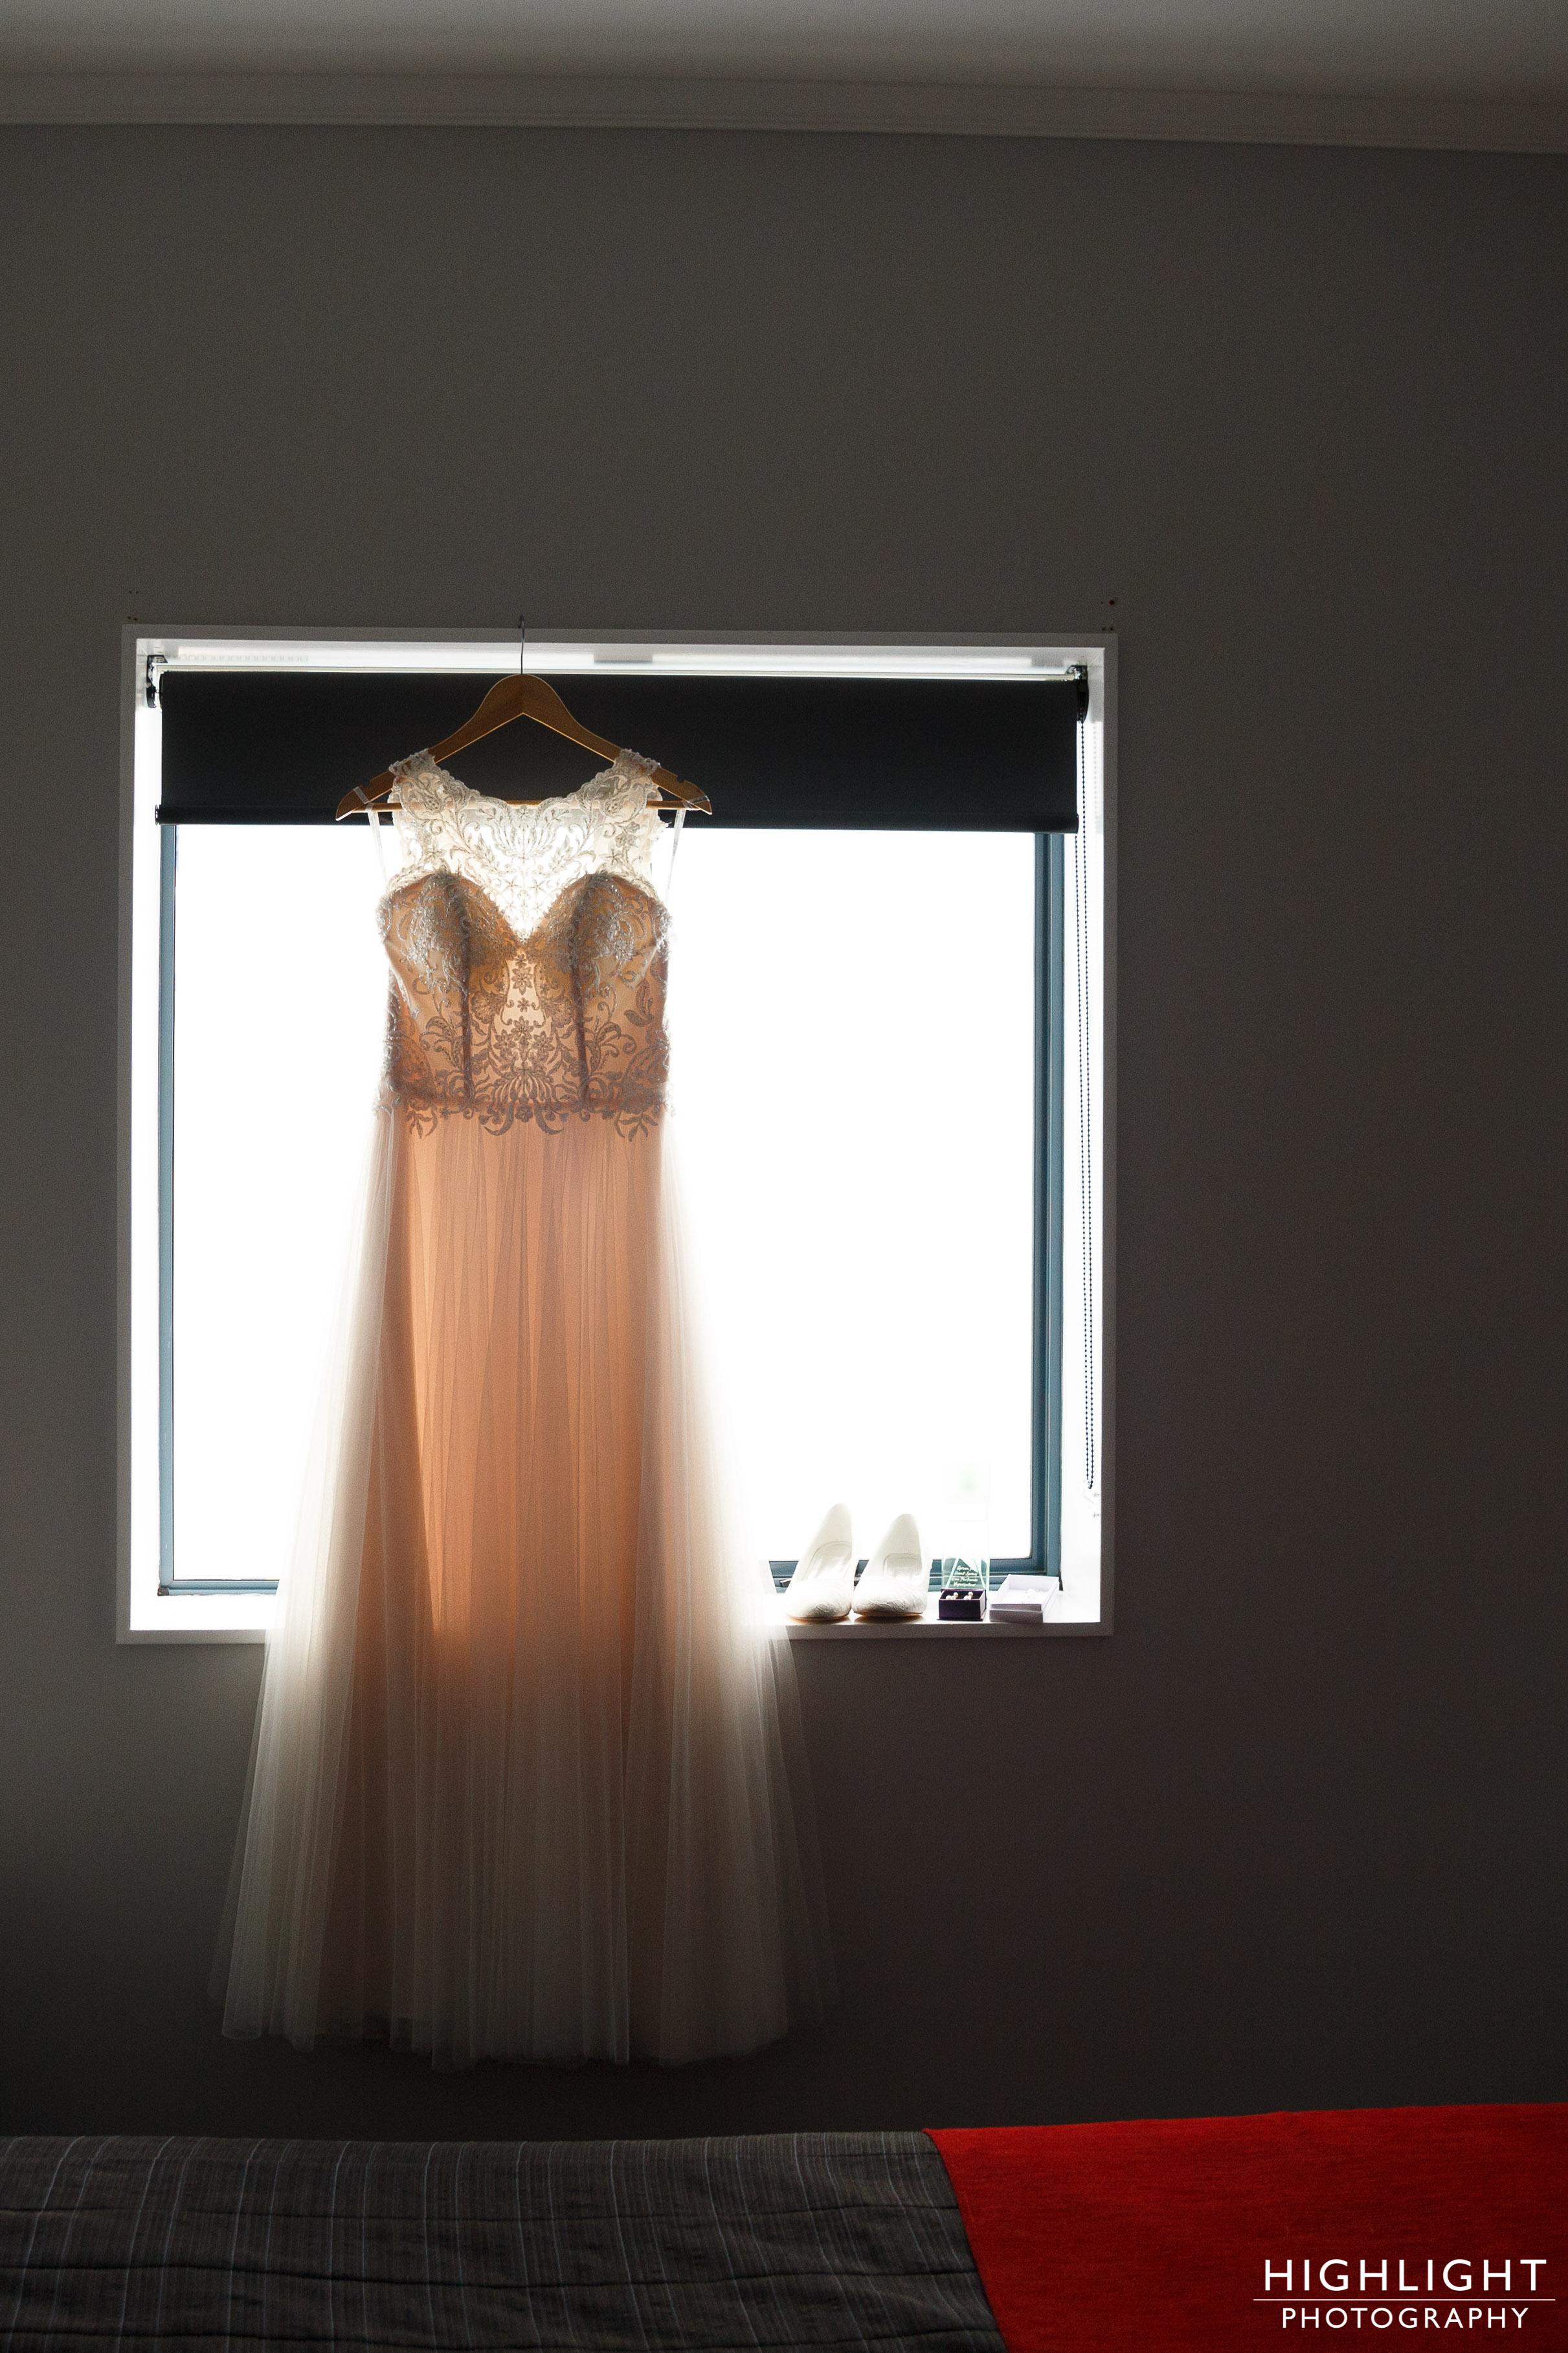 highlight-wedding-photography-palmerston-north-new-zealand-manawatu-chalet-1.jpg